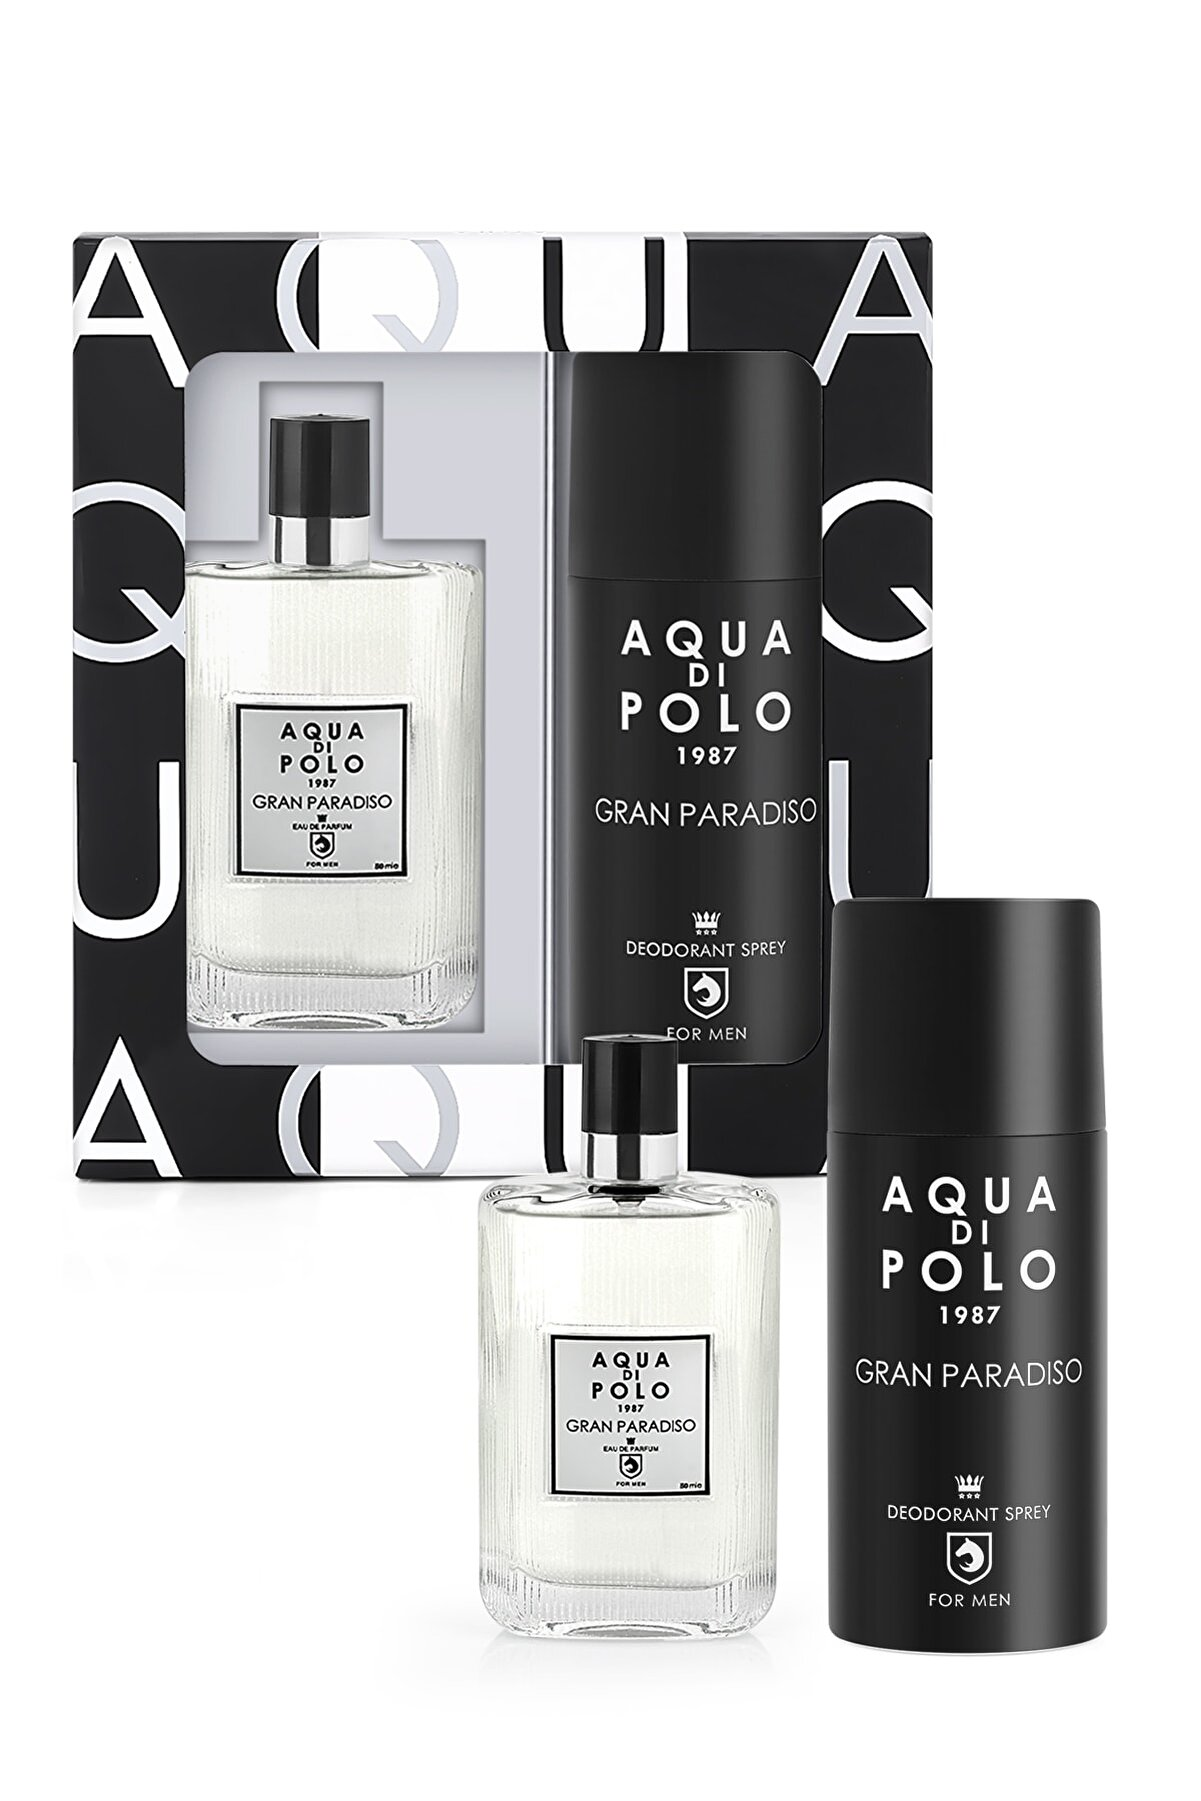 Aqua Di Polo Aynı Butikte 2. Ürün 1 TL Gran Paradiso Edp 50 ml  Erkek Parfüm-Sprey Deodorant Set APPXGR03EPD